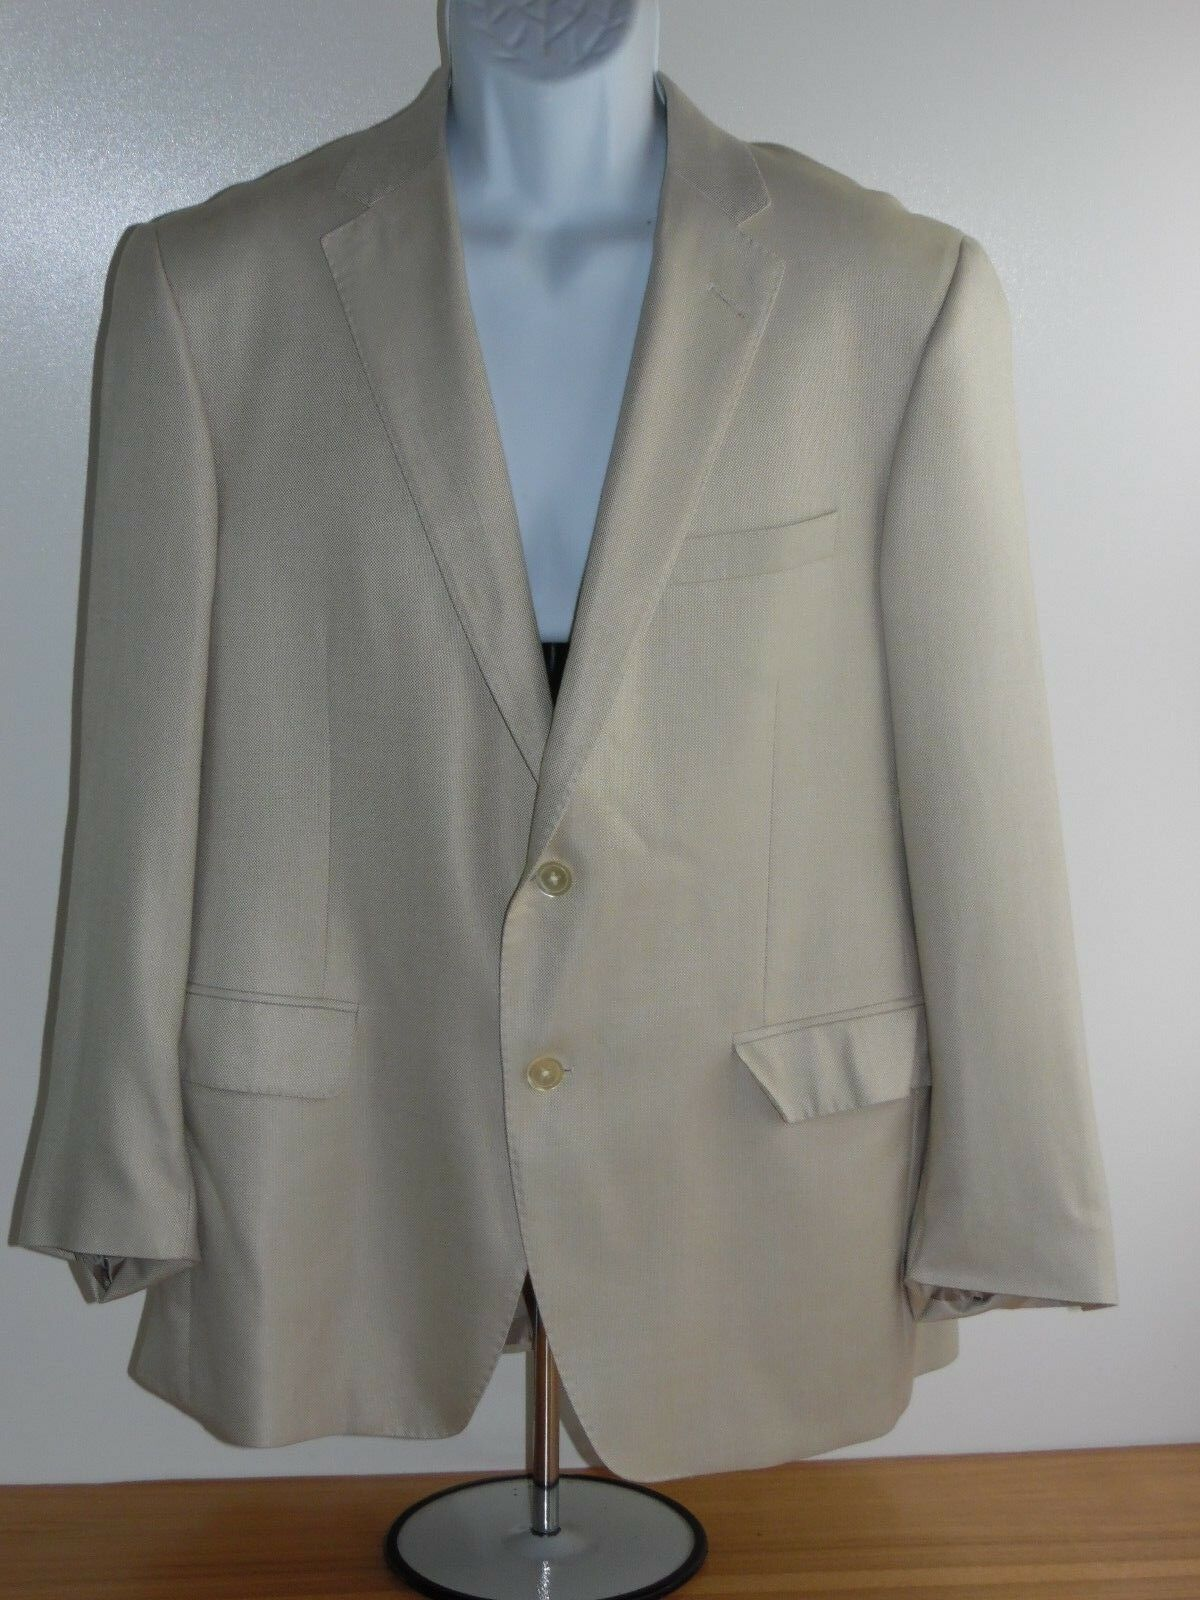 JP Tilford Samuelsohn Navy Sport Coat 42S  SB Justin bamboo rayon